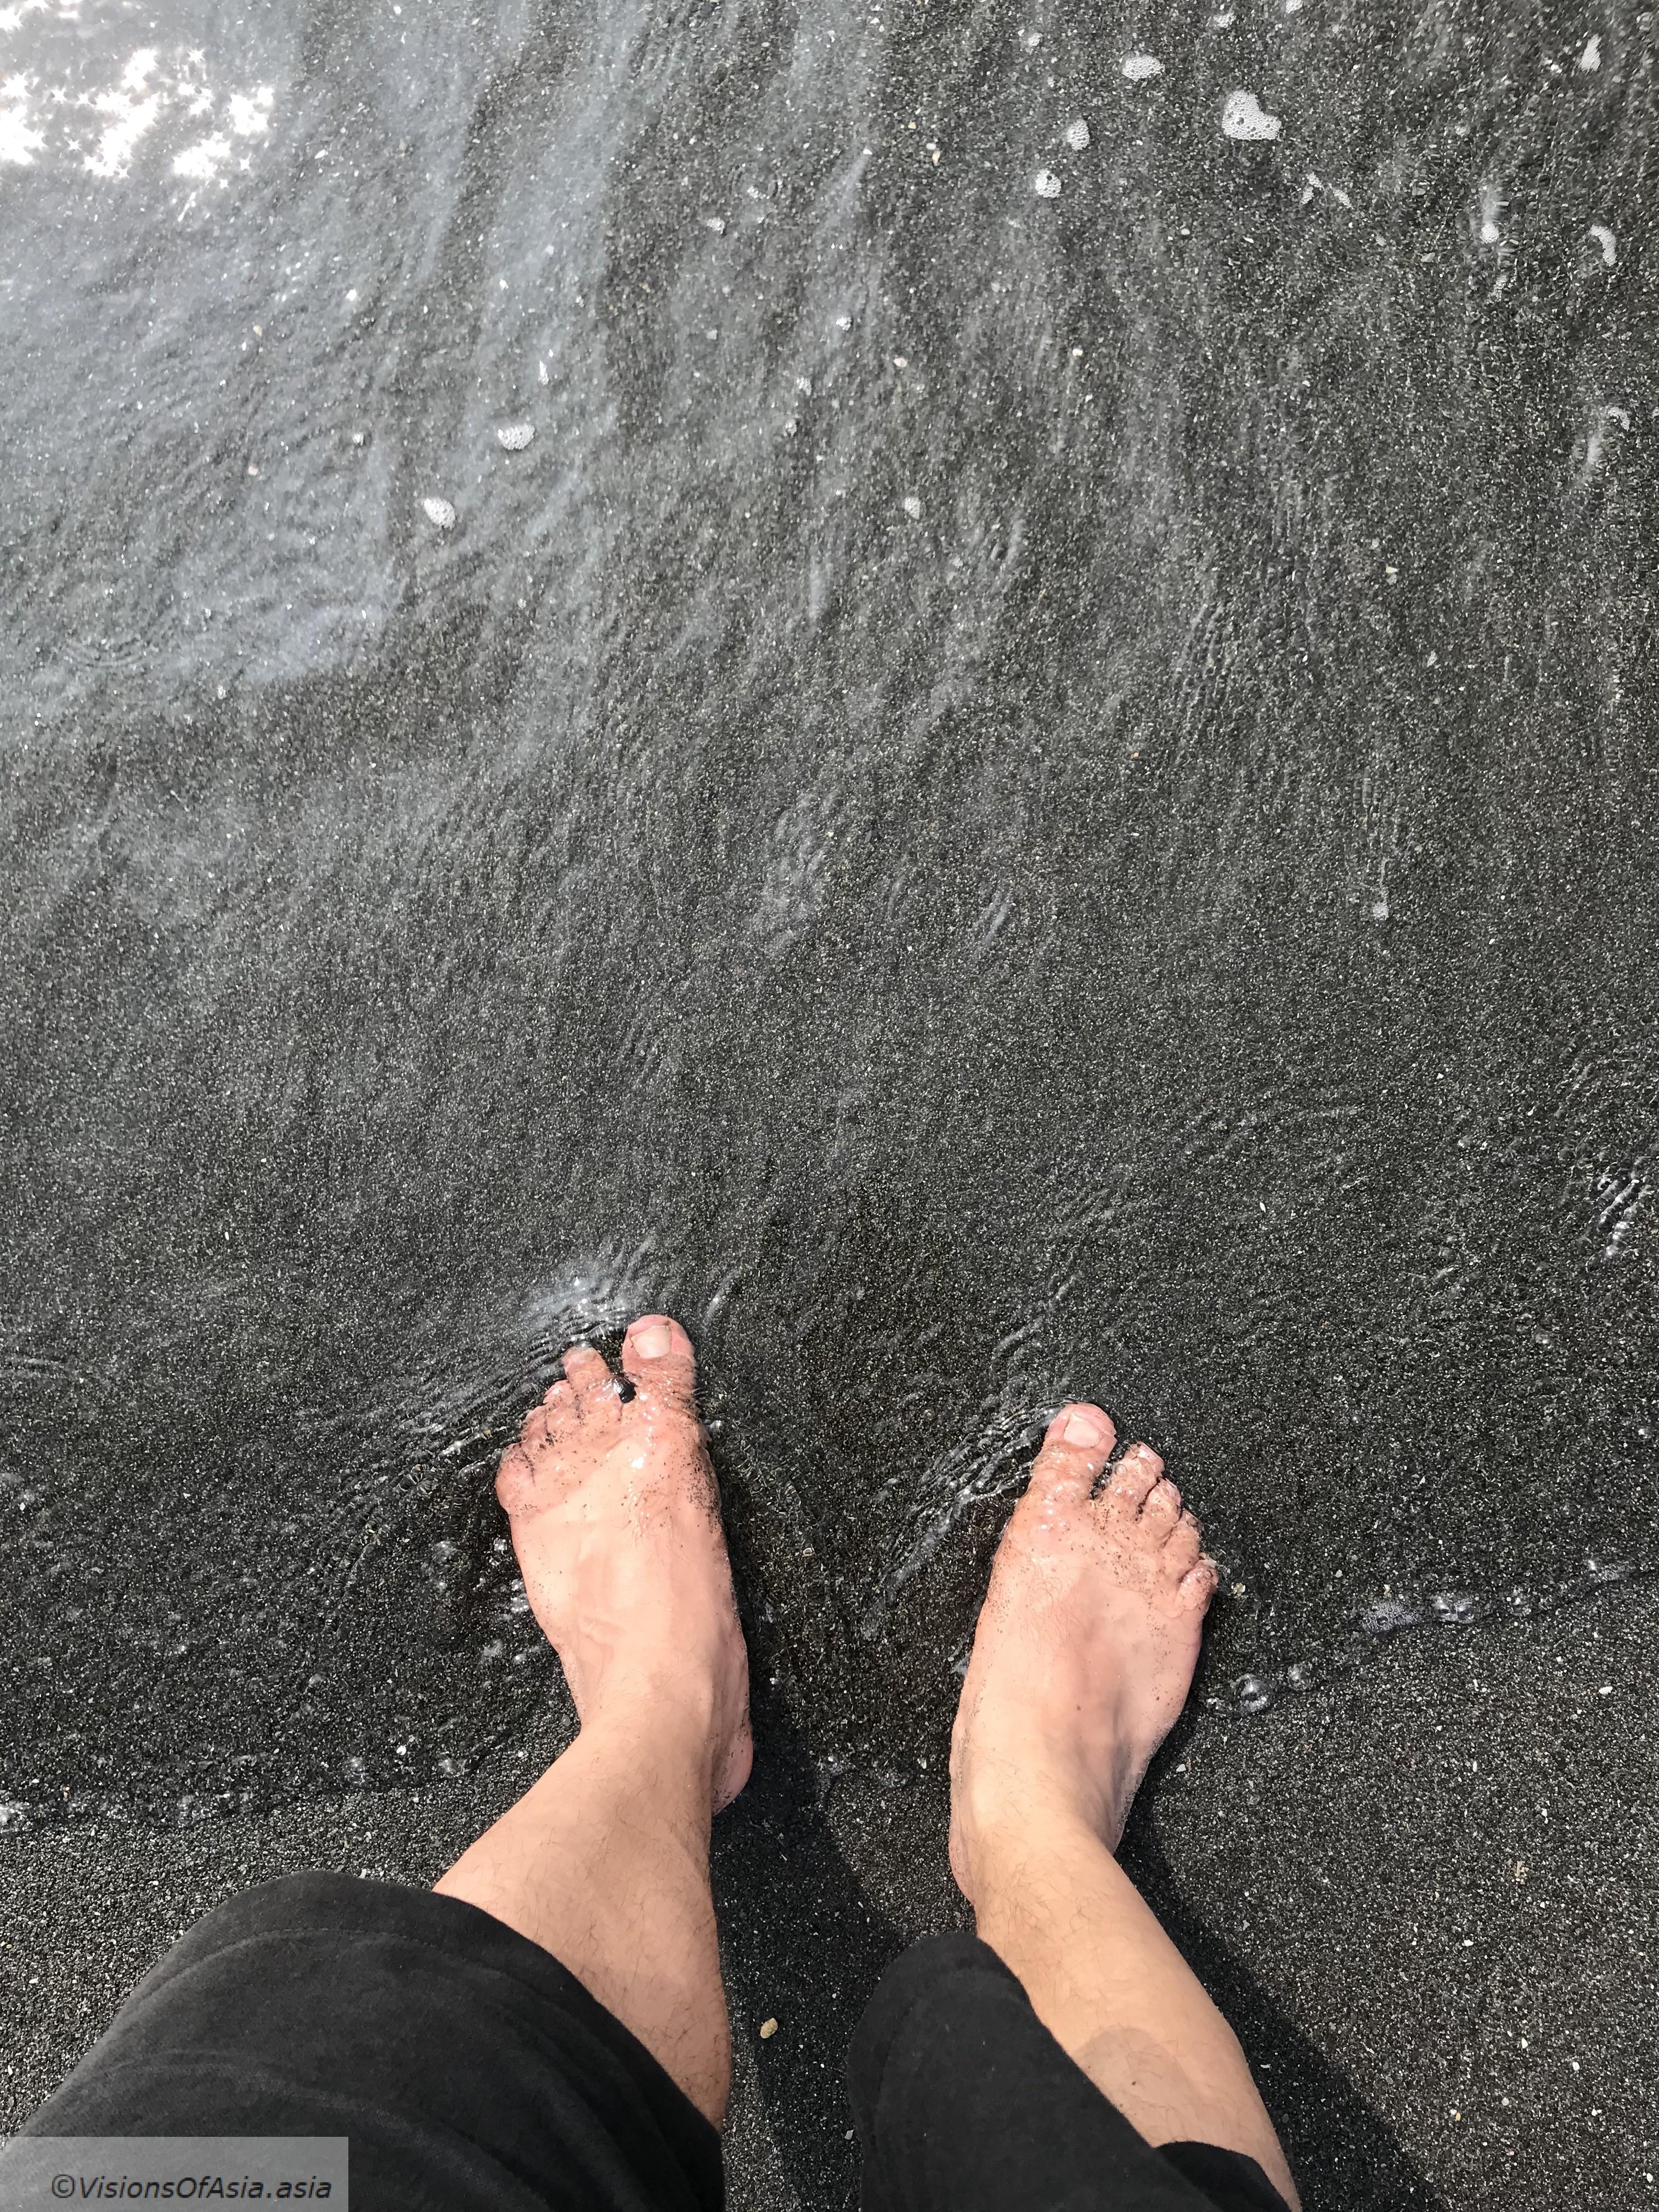 Seawater on feet